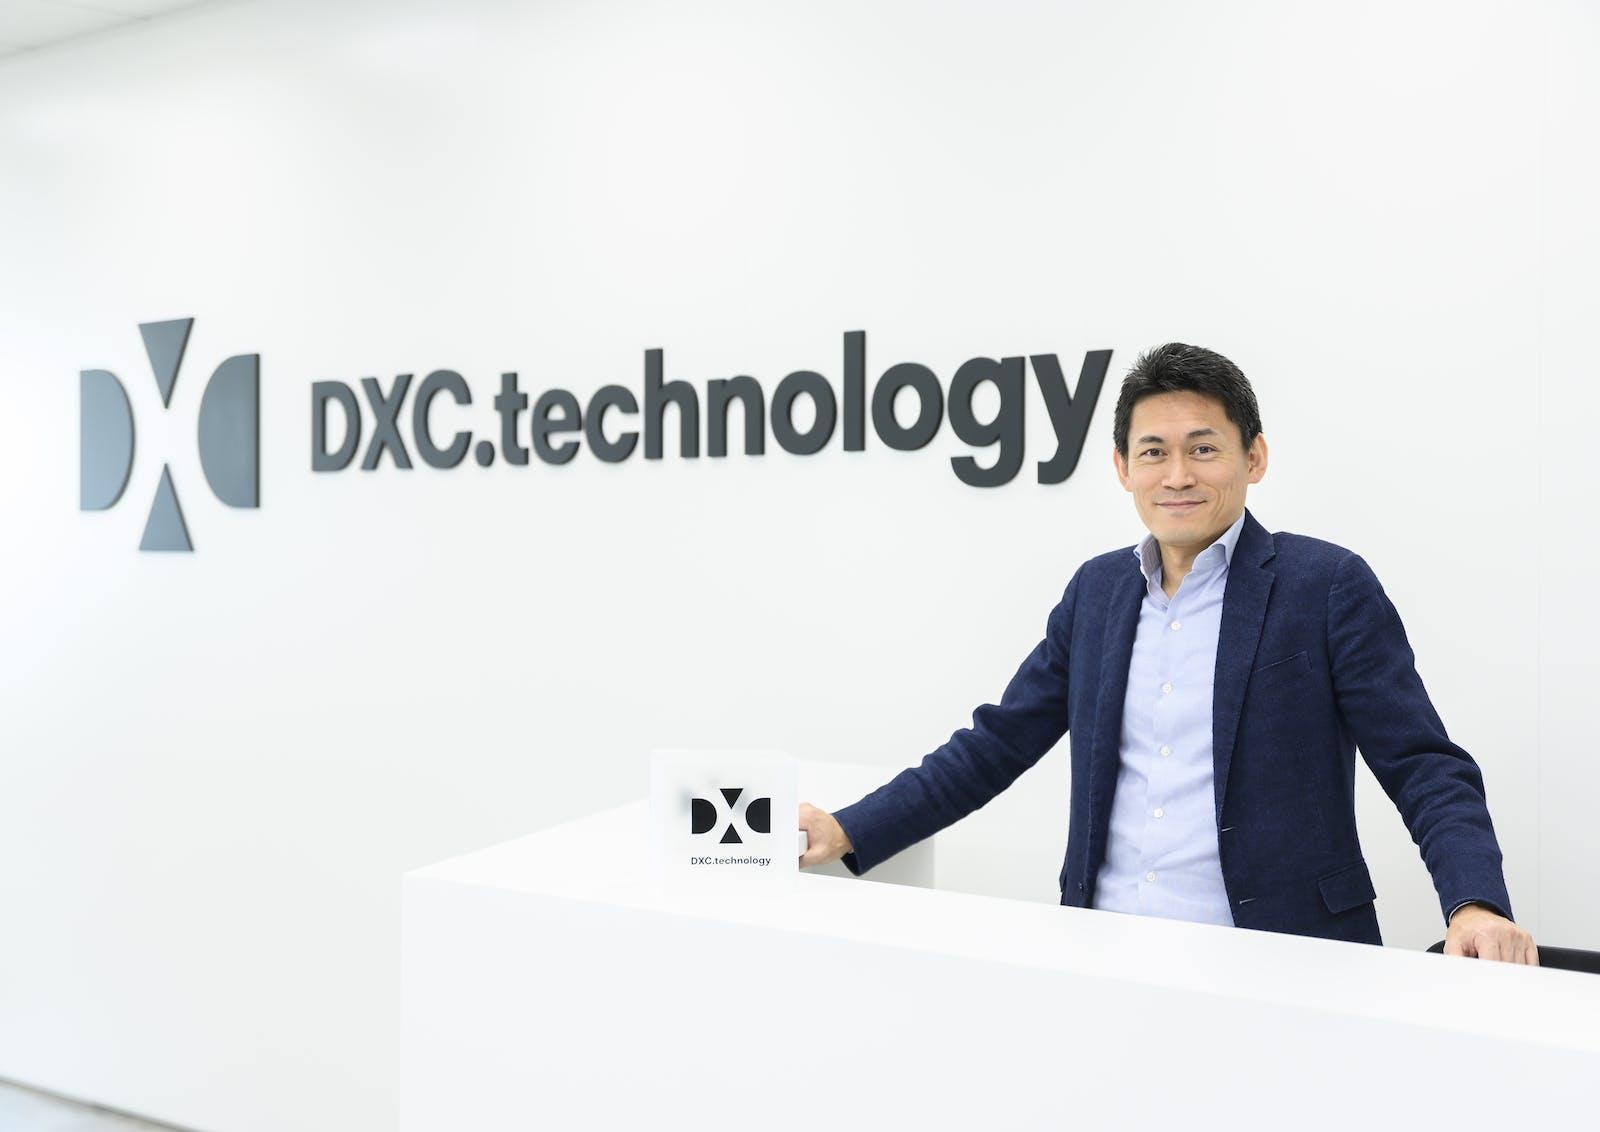 DXCテクノロジー・ジャパン合同会社のアイキャッチ画像